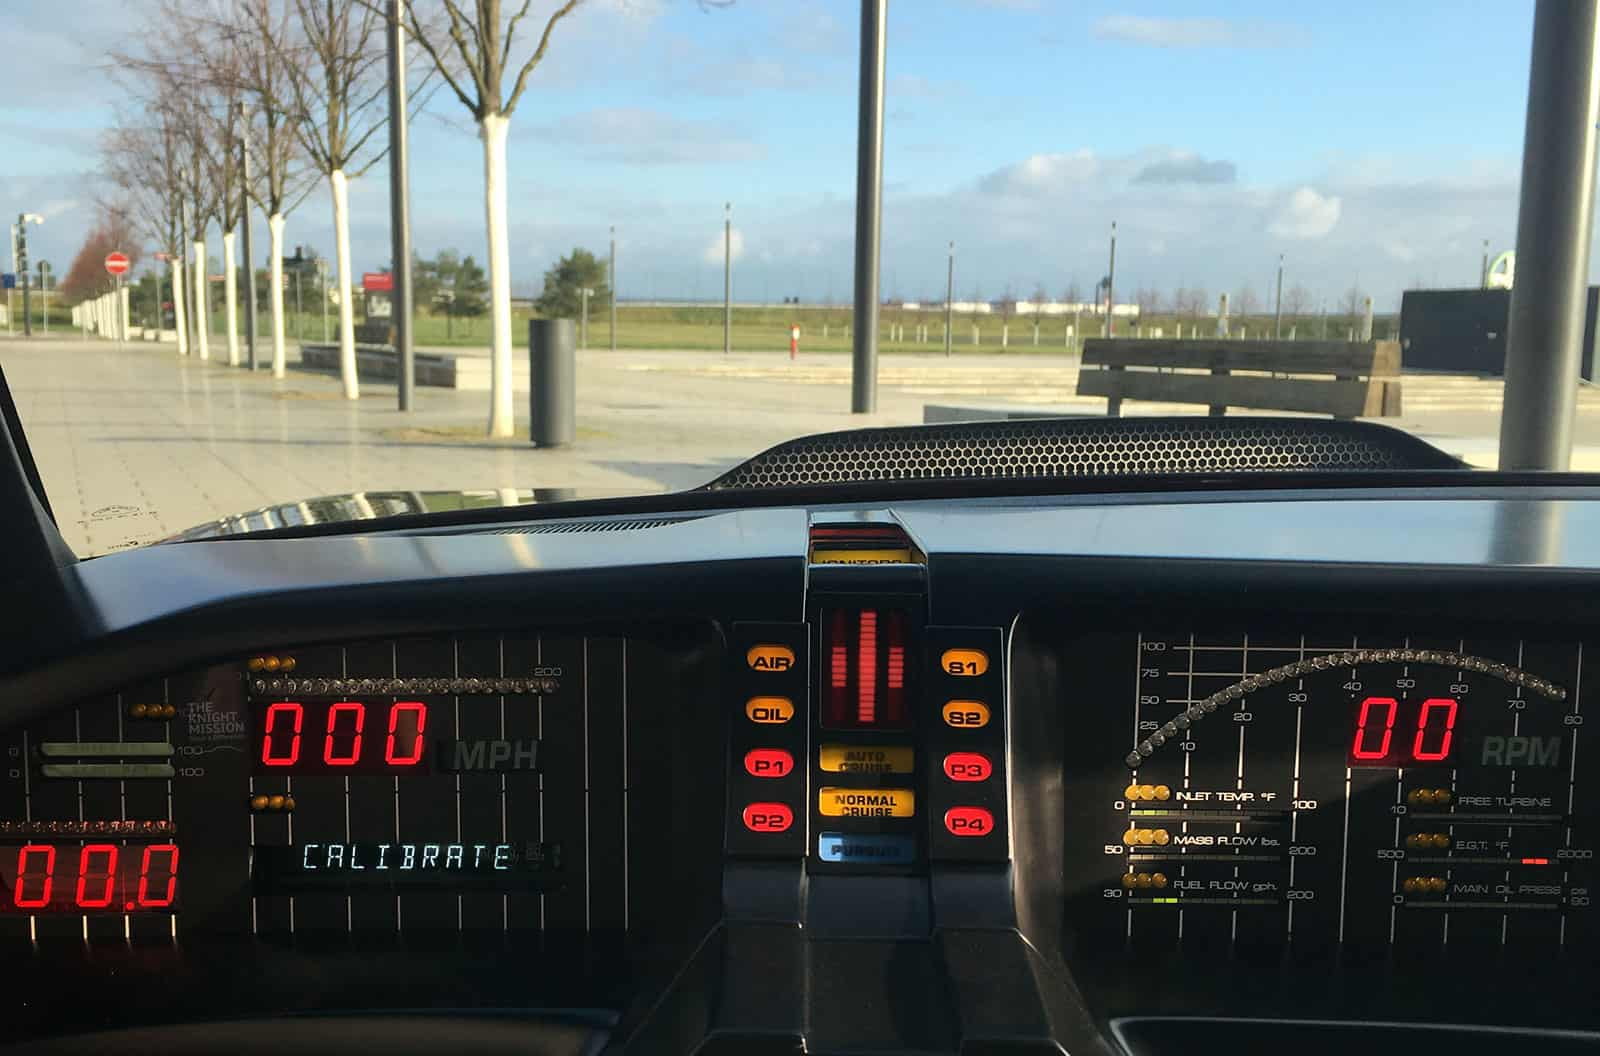 KITT Replika Dashboard Voice Box Knight Rider